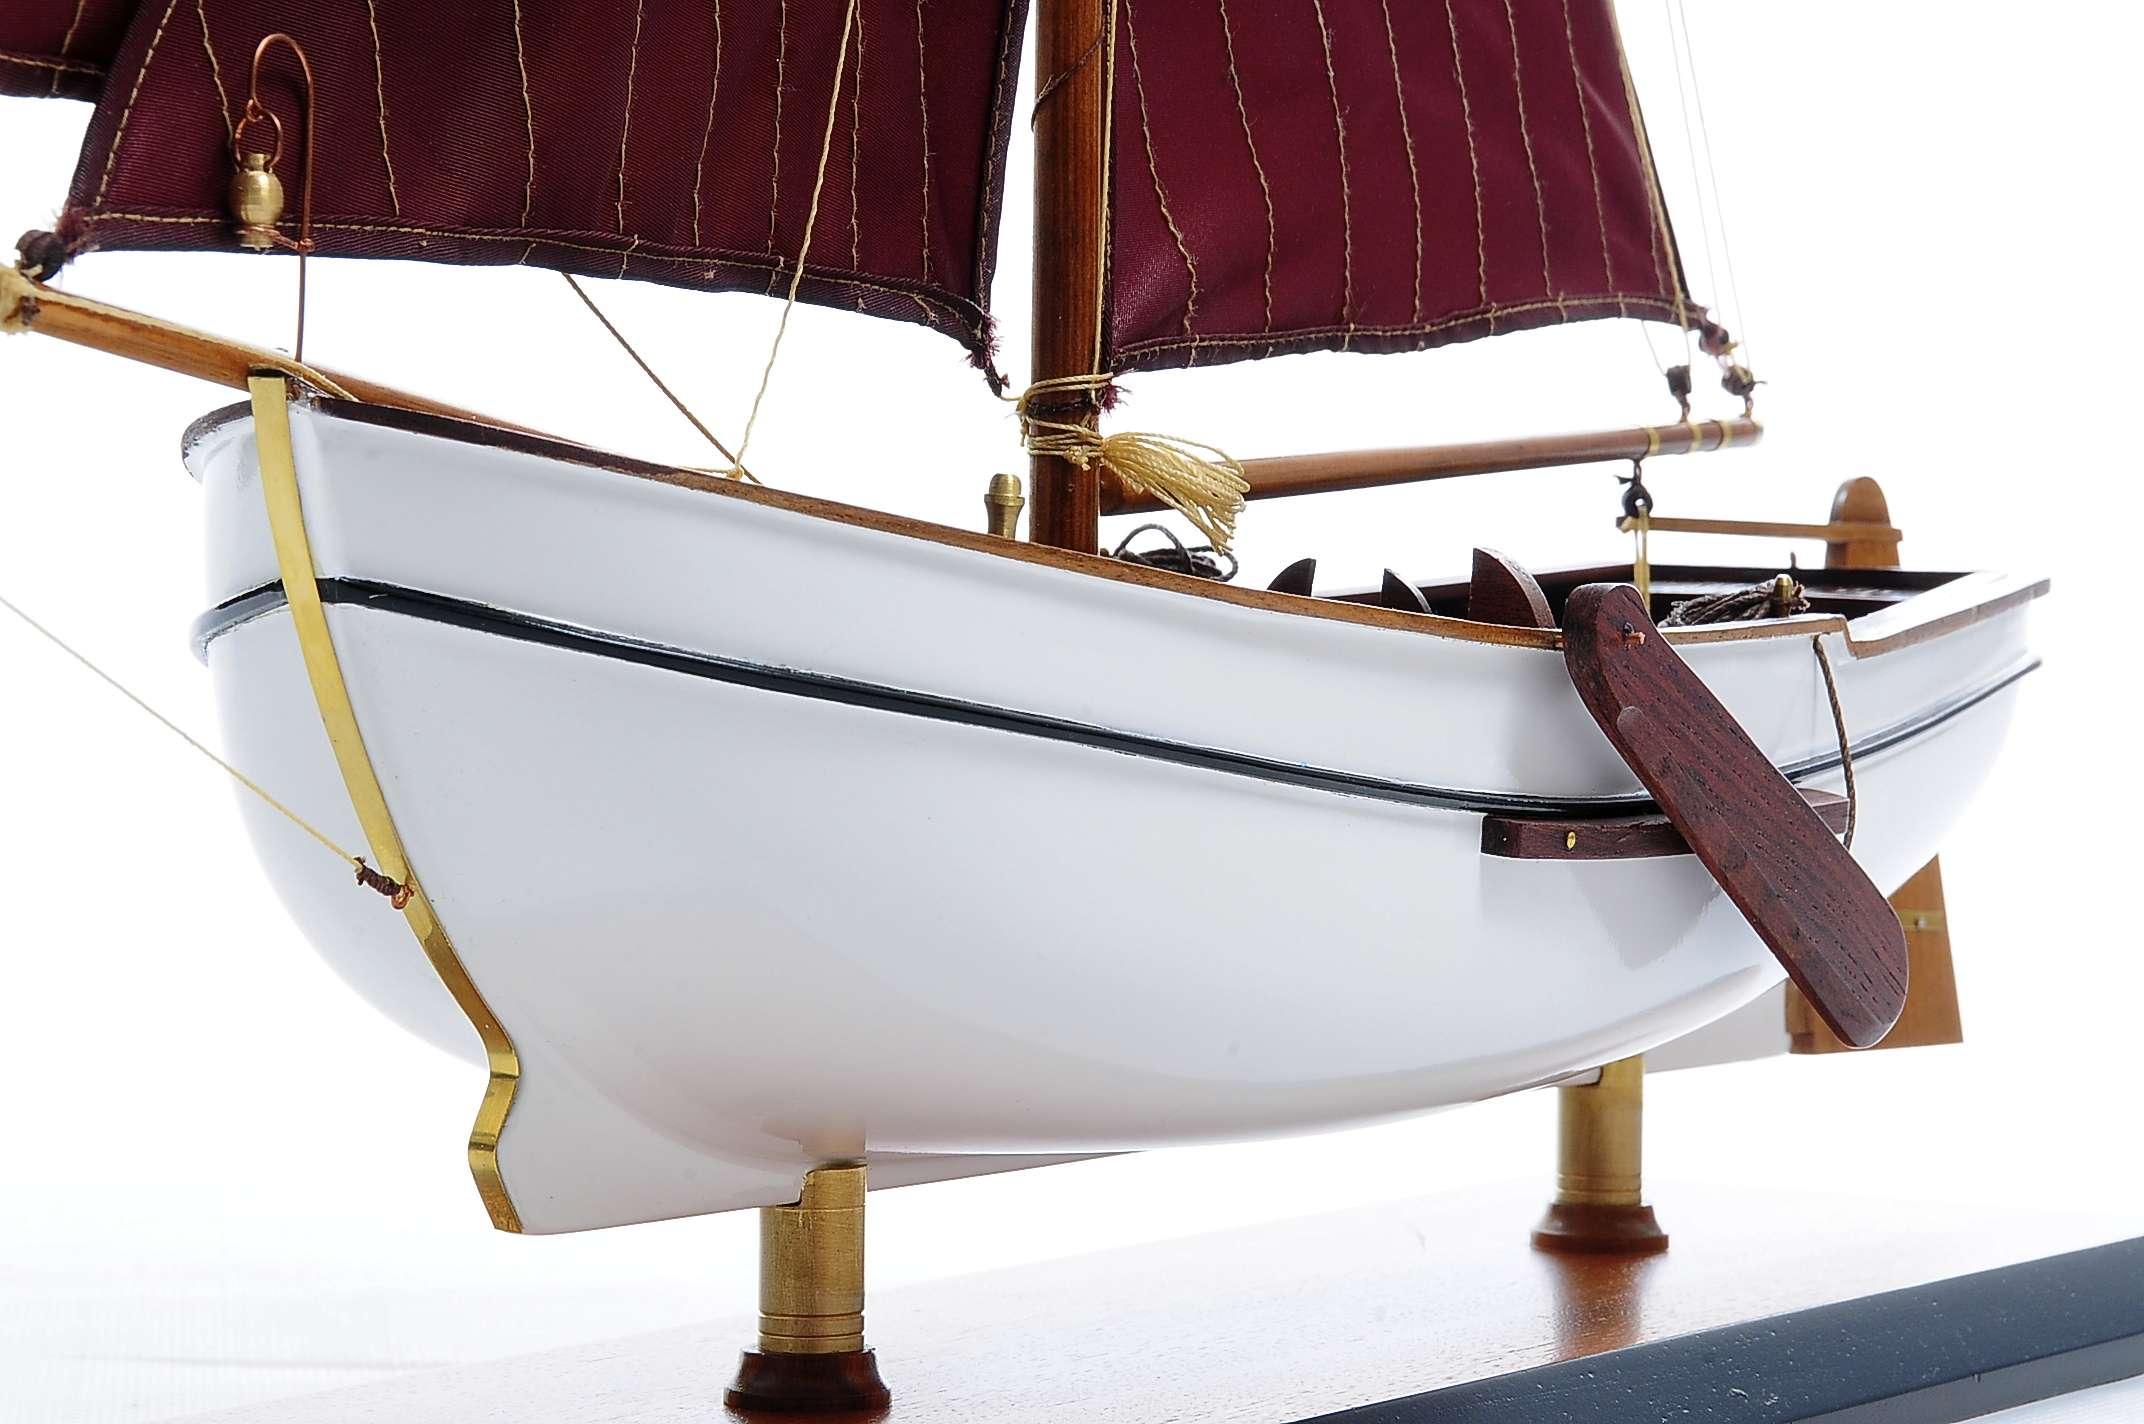 1432-4576-Dutch-Marker-Roundbow-Model-Boat